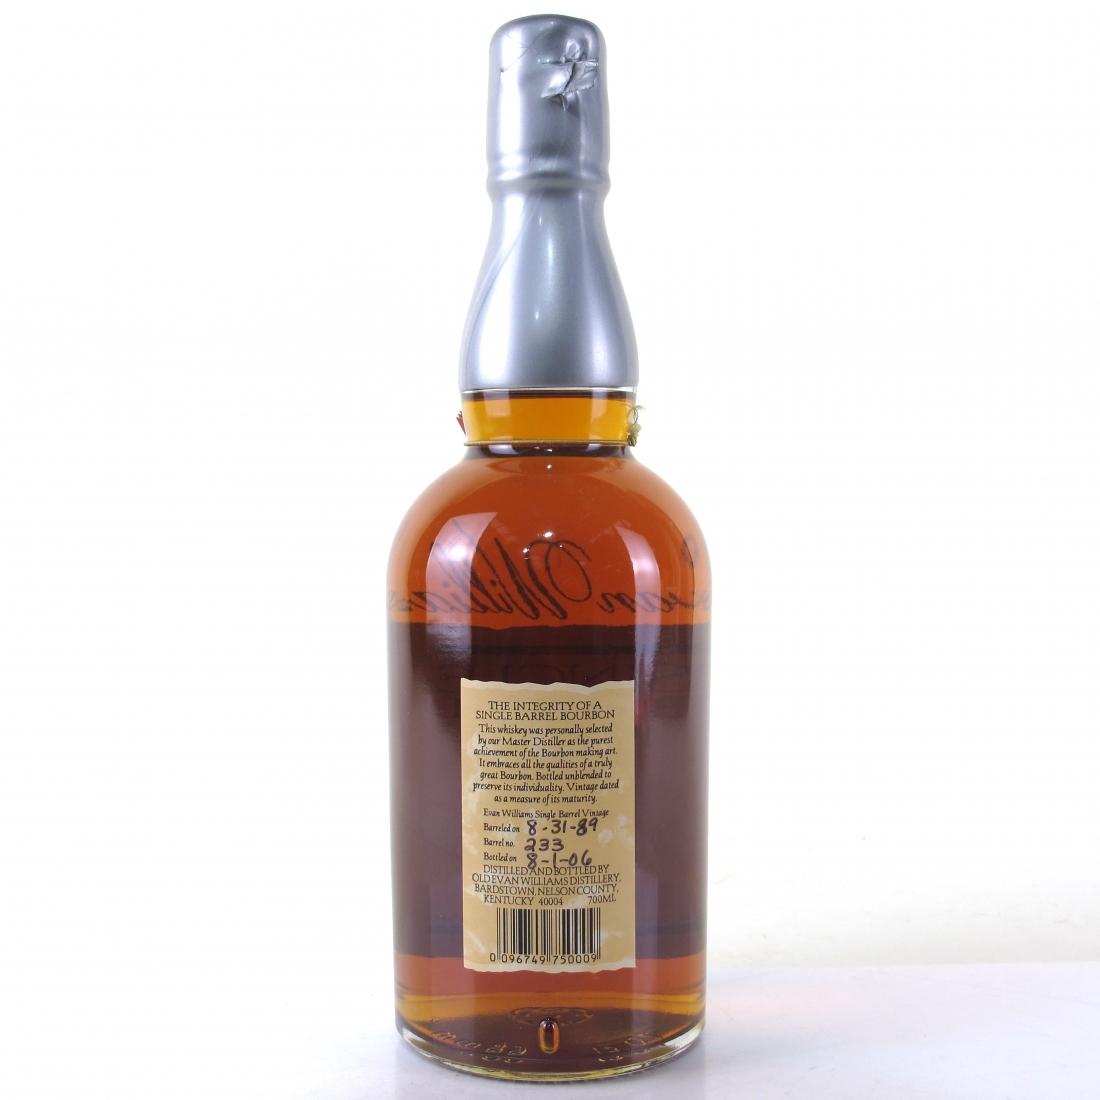 Evan Williams 1989 Single Barrel 17 Year Old / La Maison Du Whisky